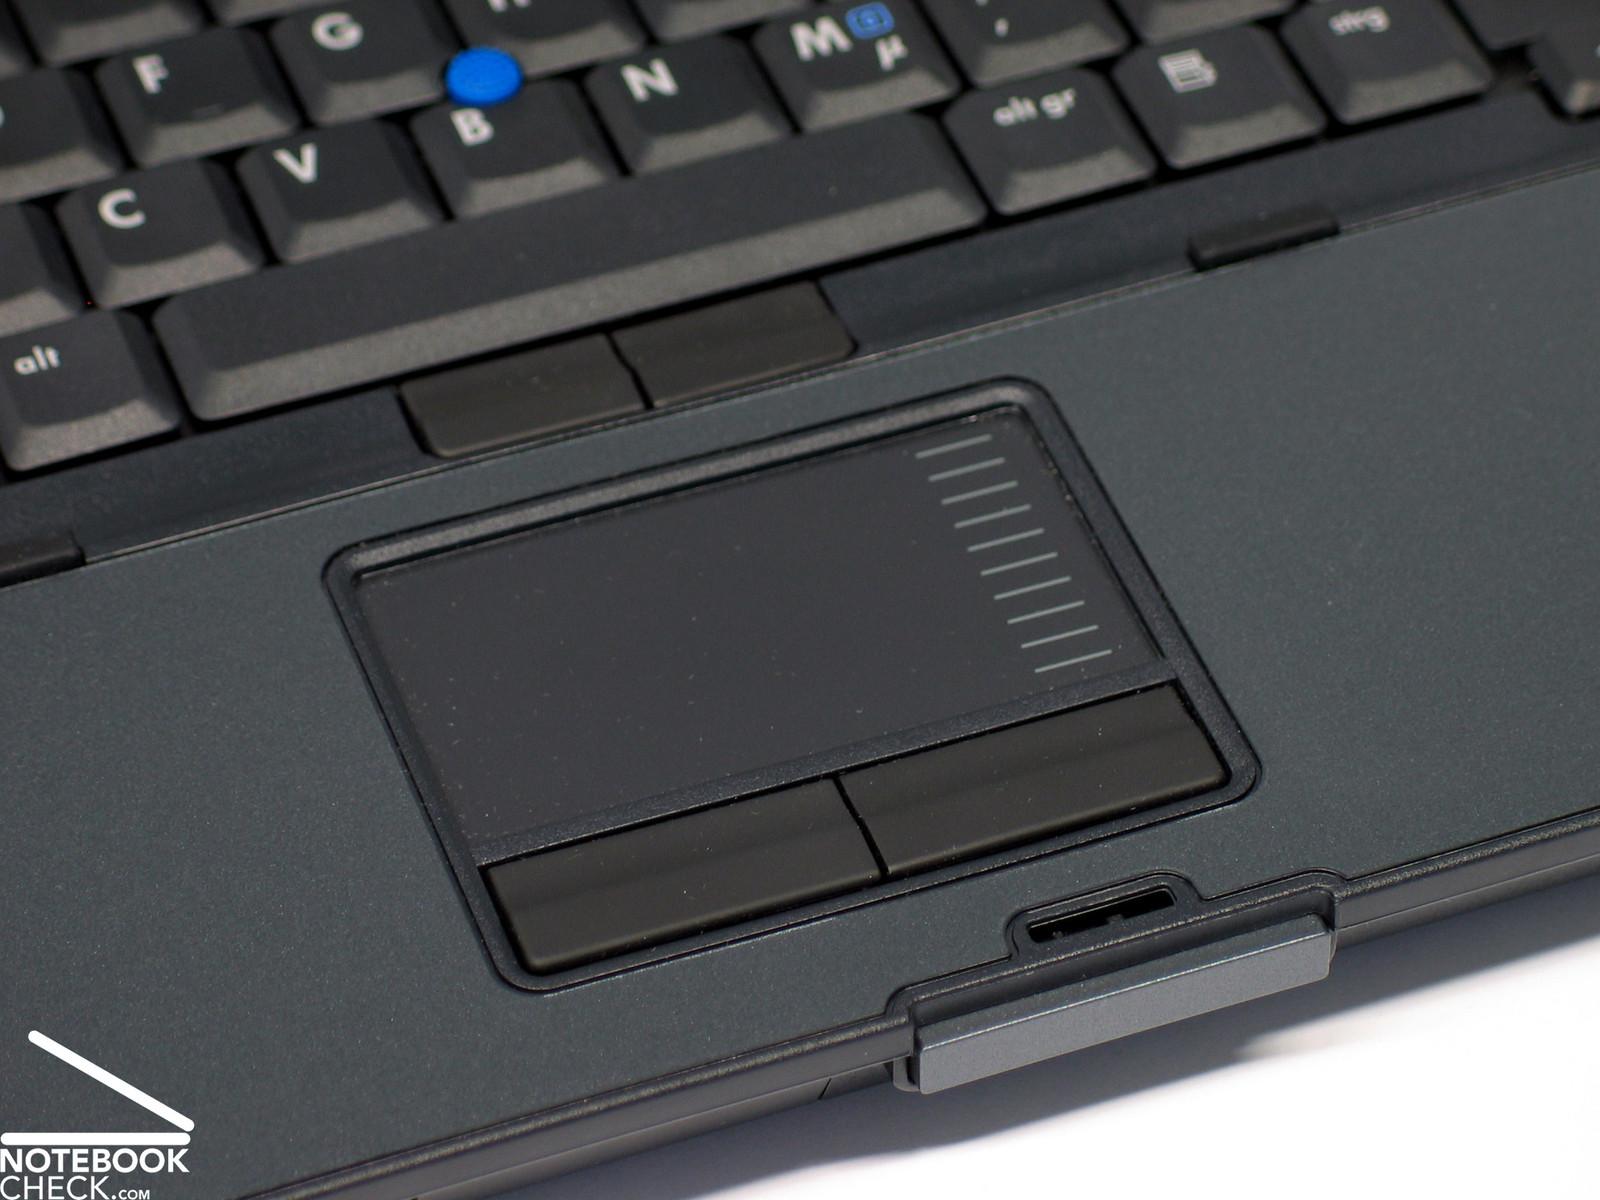 COMPAQ NC4400 FINGERPRINT DRIVERS FOR PC